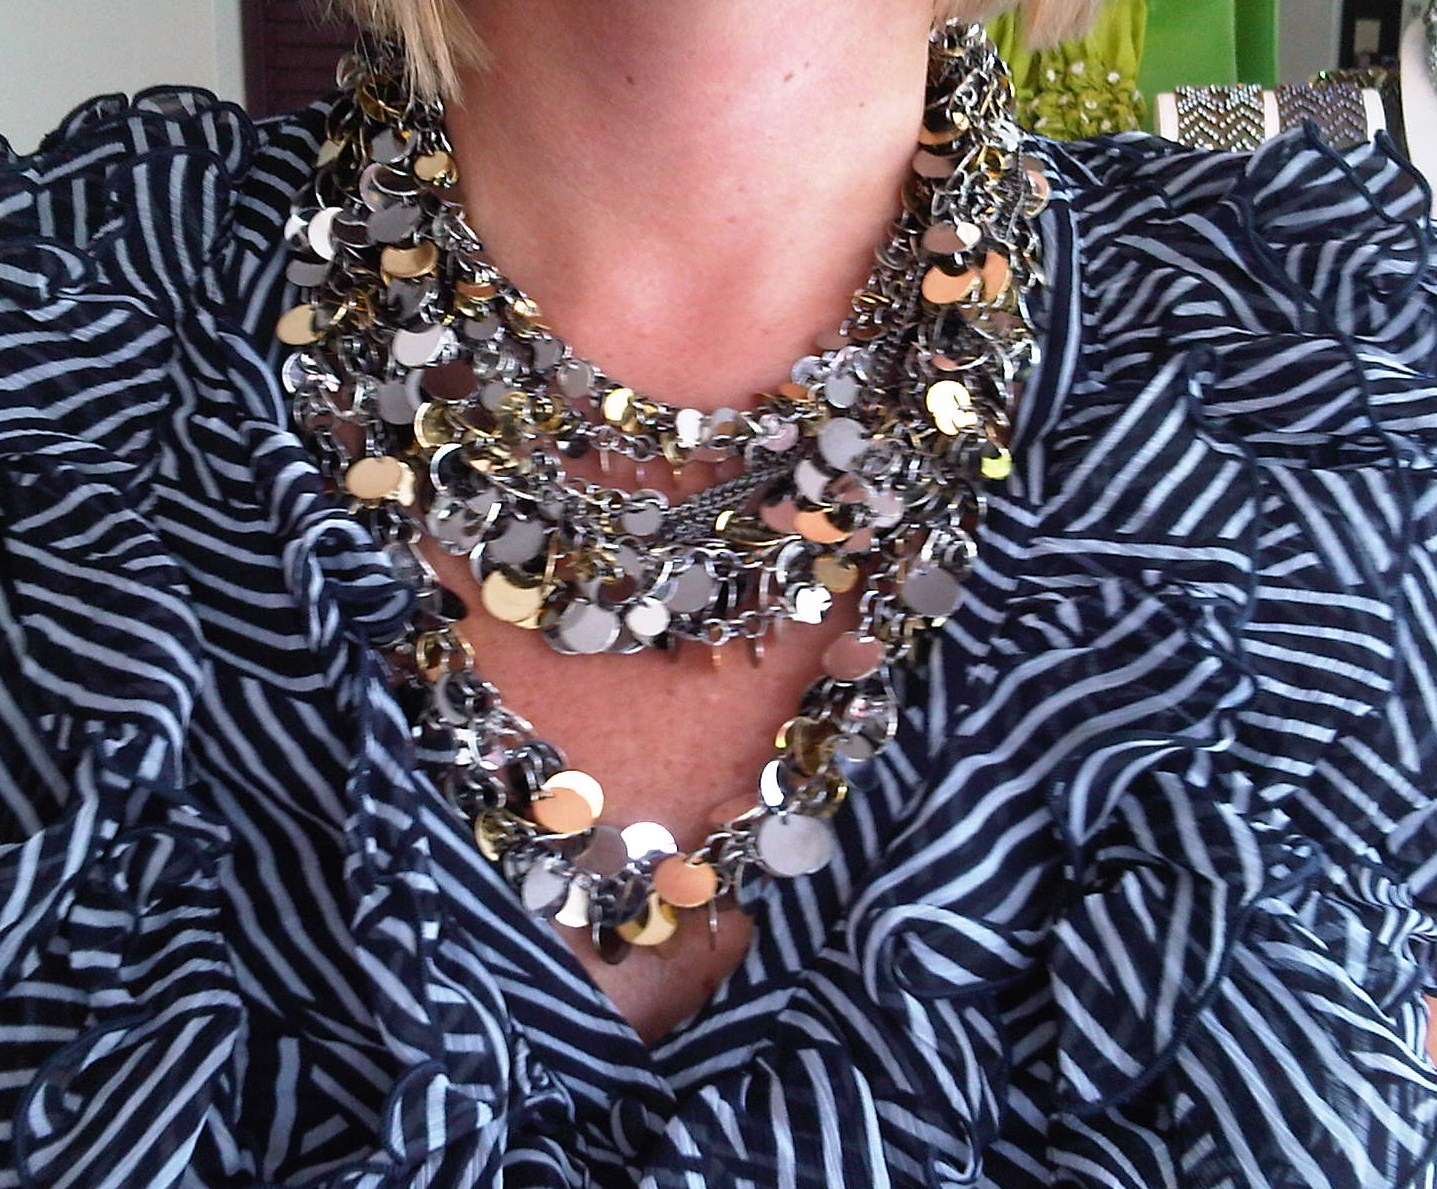 http://3.bp.blogspot.com/_vdvyFuHPSiM/TGnktN7vbVI/AAAAAAAAAFI/DuEi892XNEY/s1600/kjl+necklace.jpg